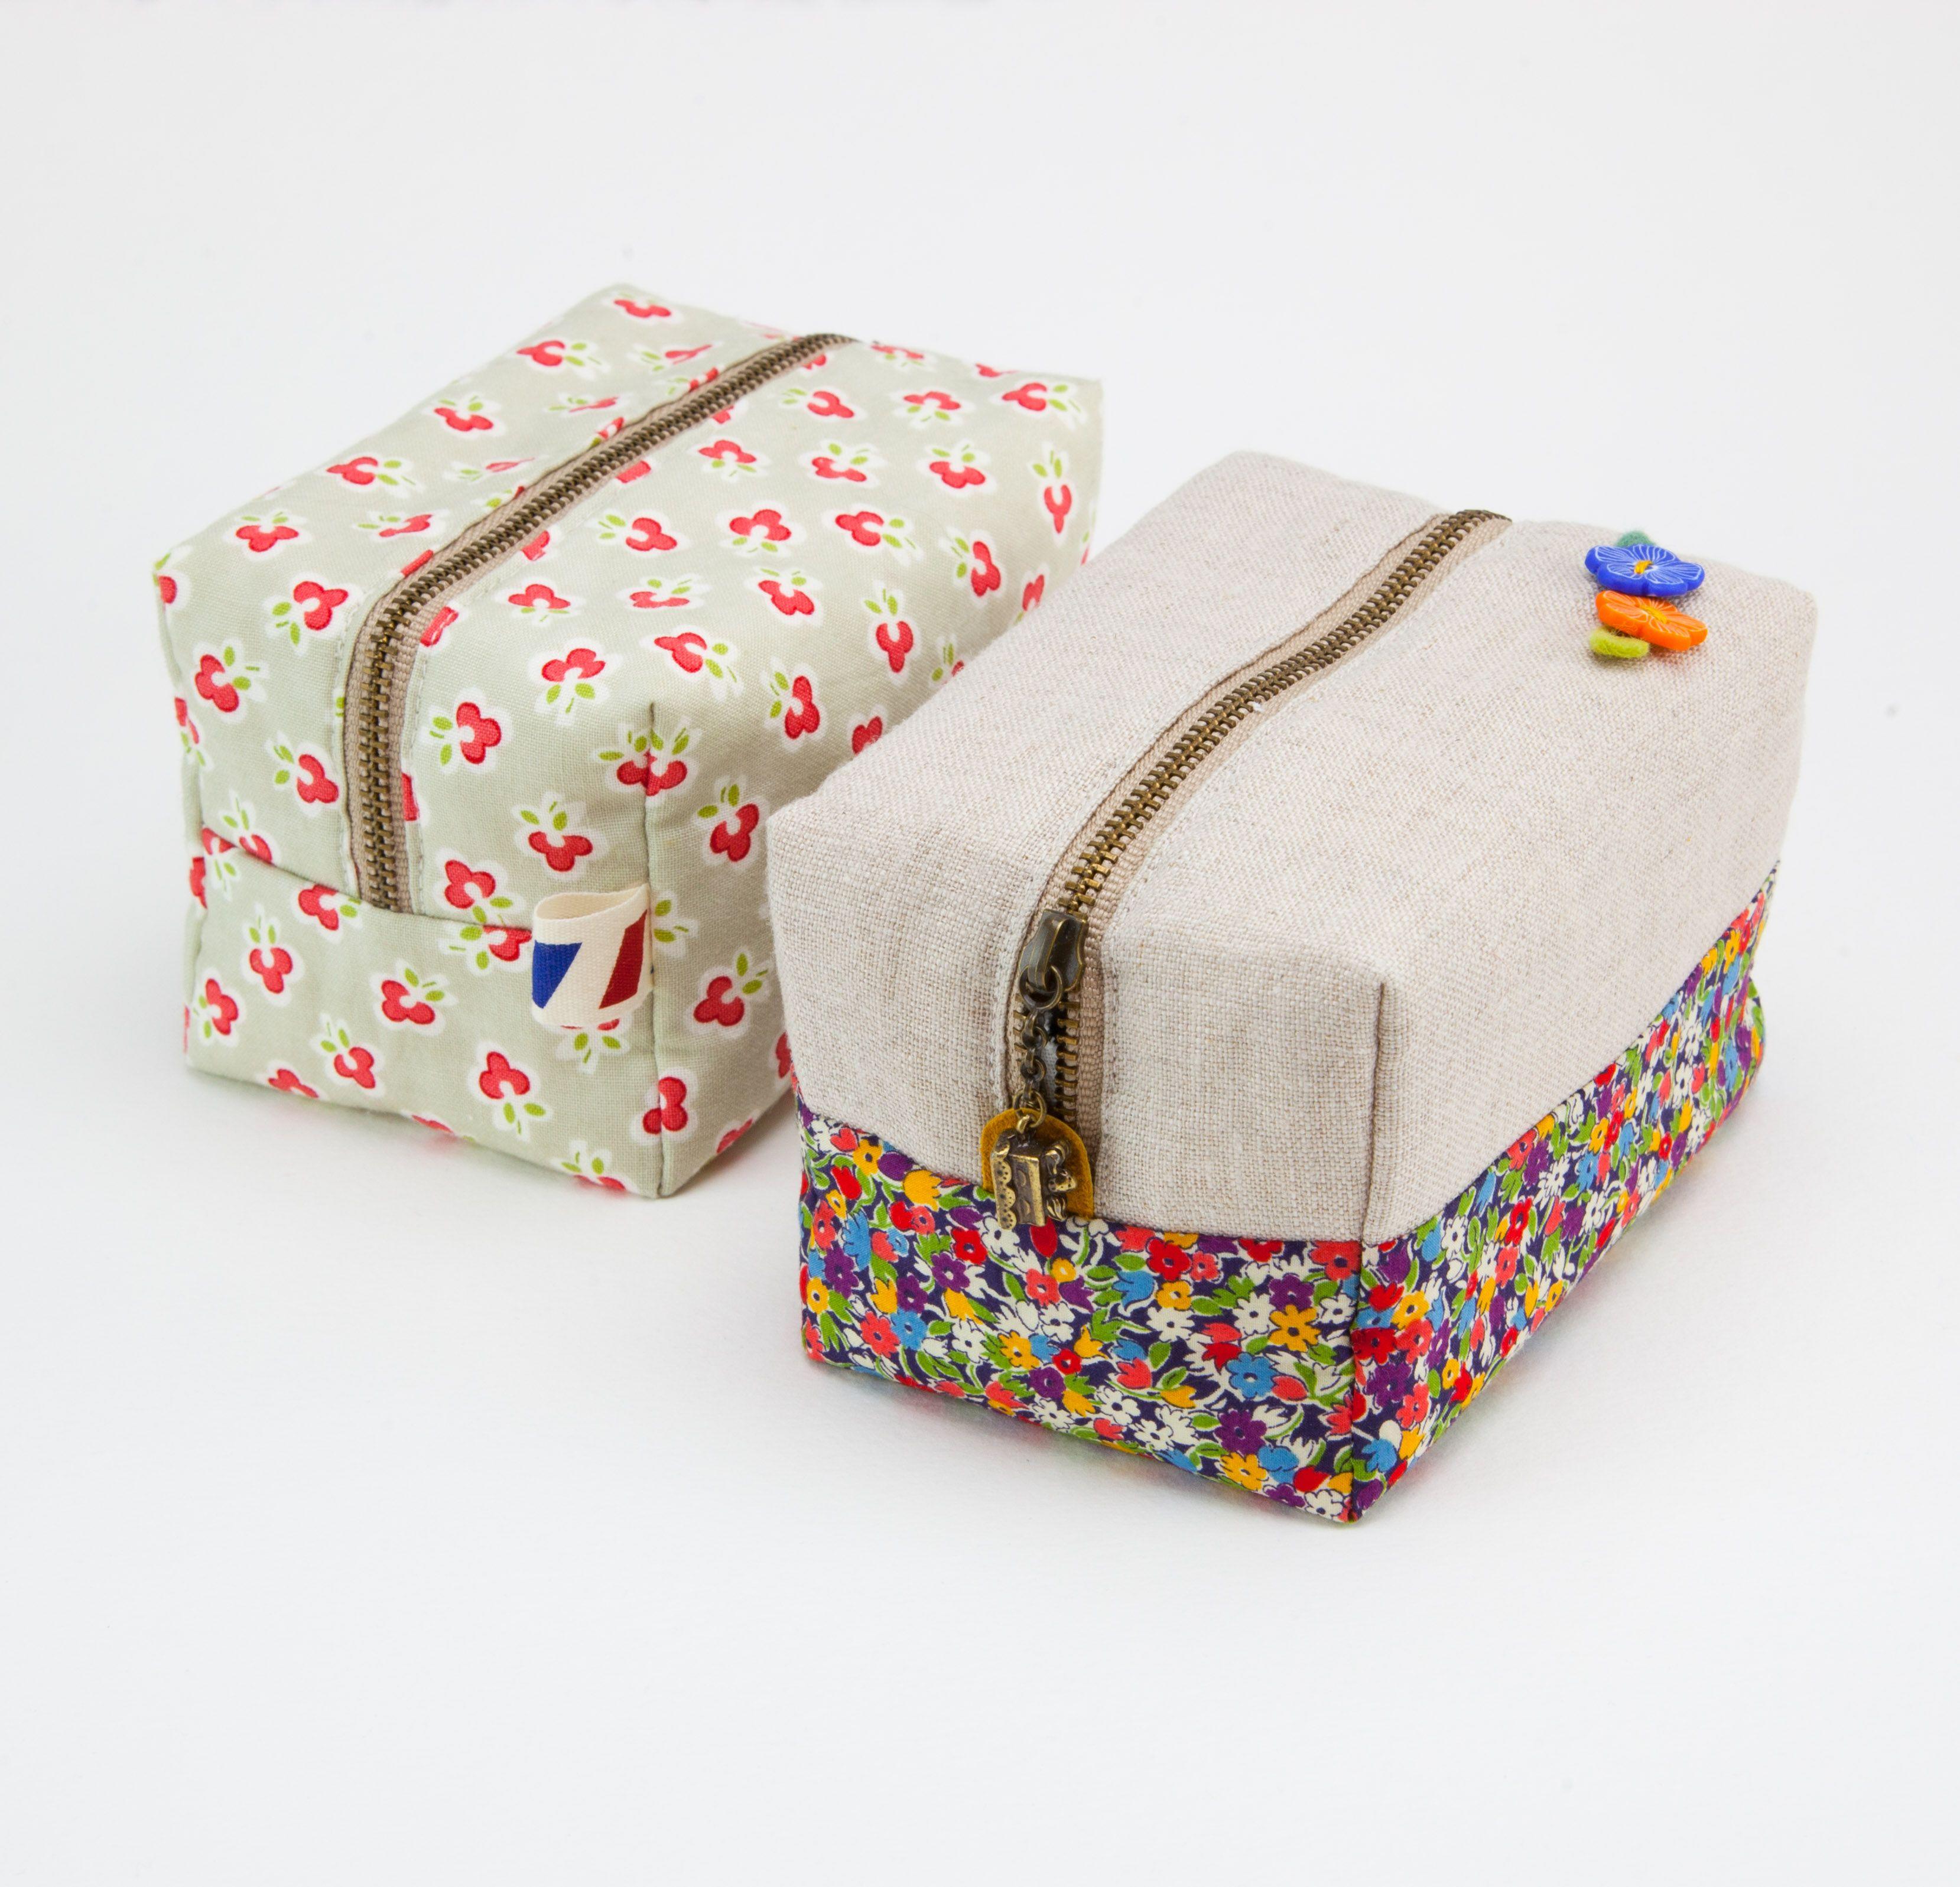 trousses rectangles couture pinterest couture couture sac et pochette. Black Bedroom Furniture Sets. Home Design Ideas